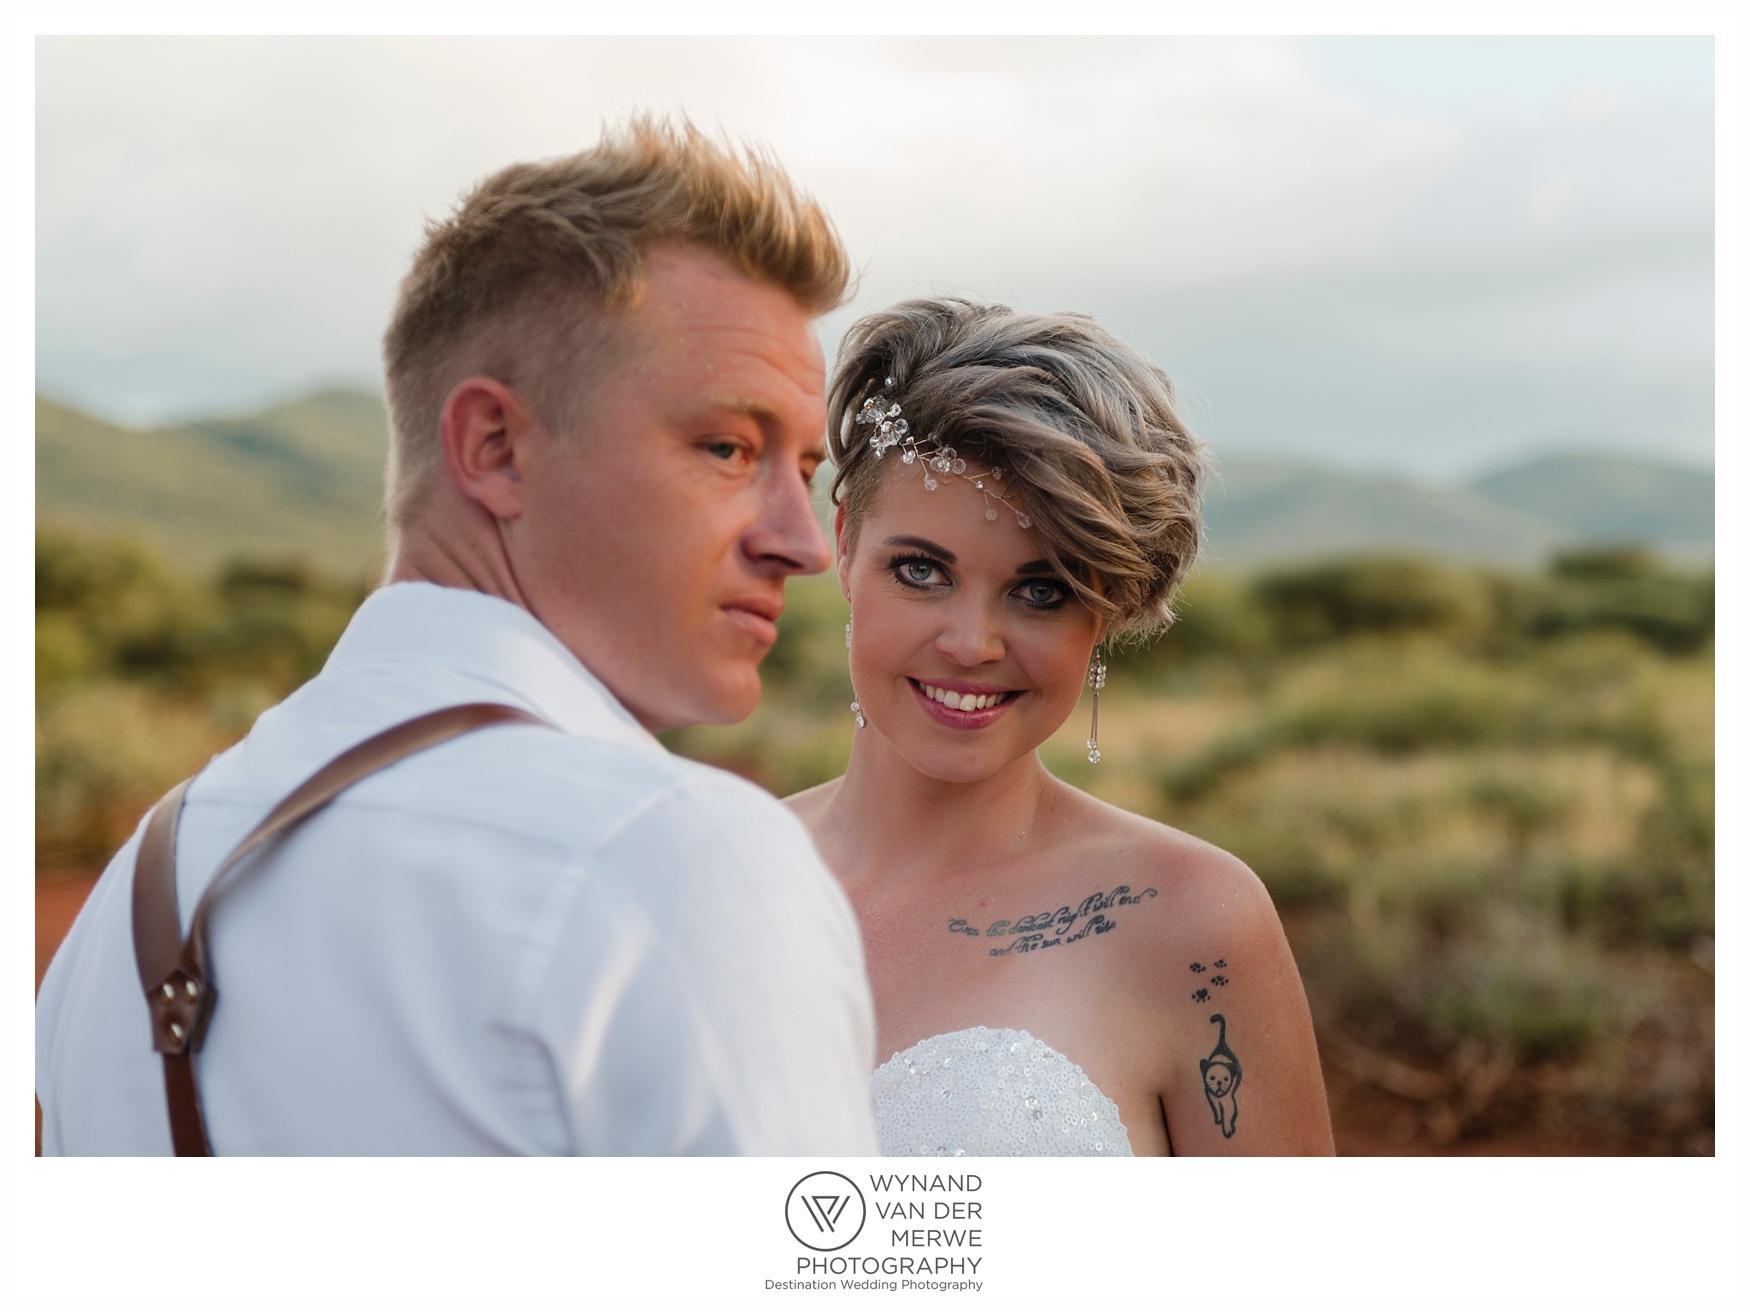 WynandvanderMerwe_weddingphotography_bushveldwedding_northam_bushveld_limpopowedding_limpopo_southafrica-266.jpg